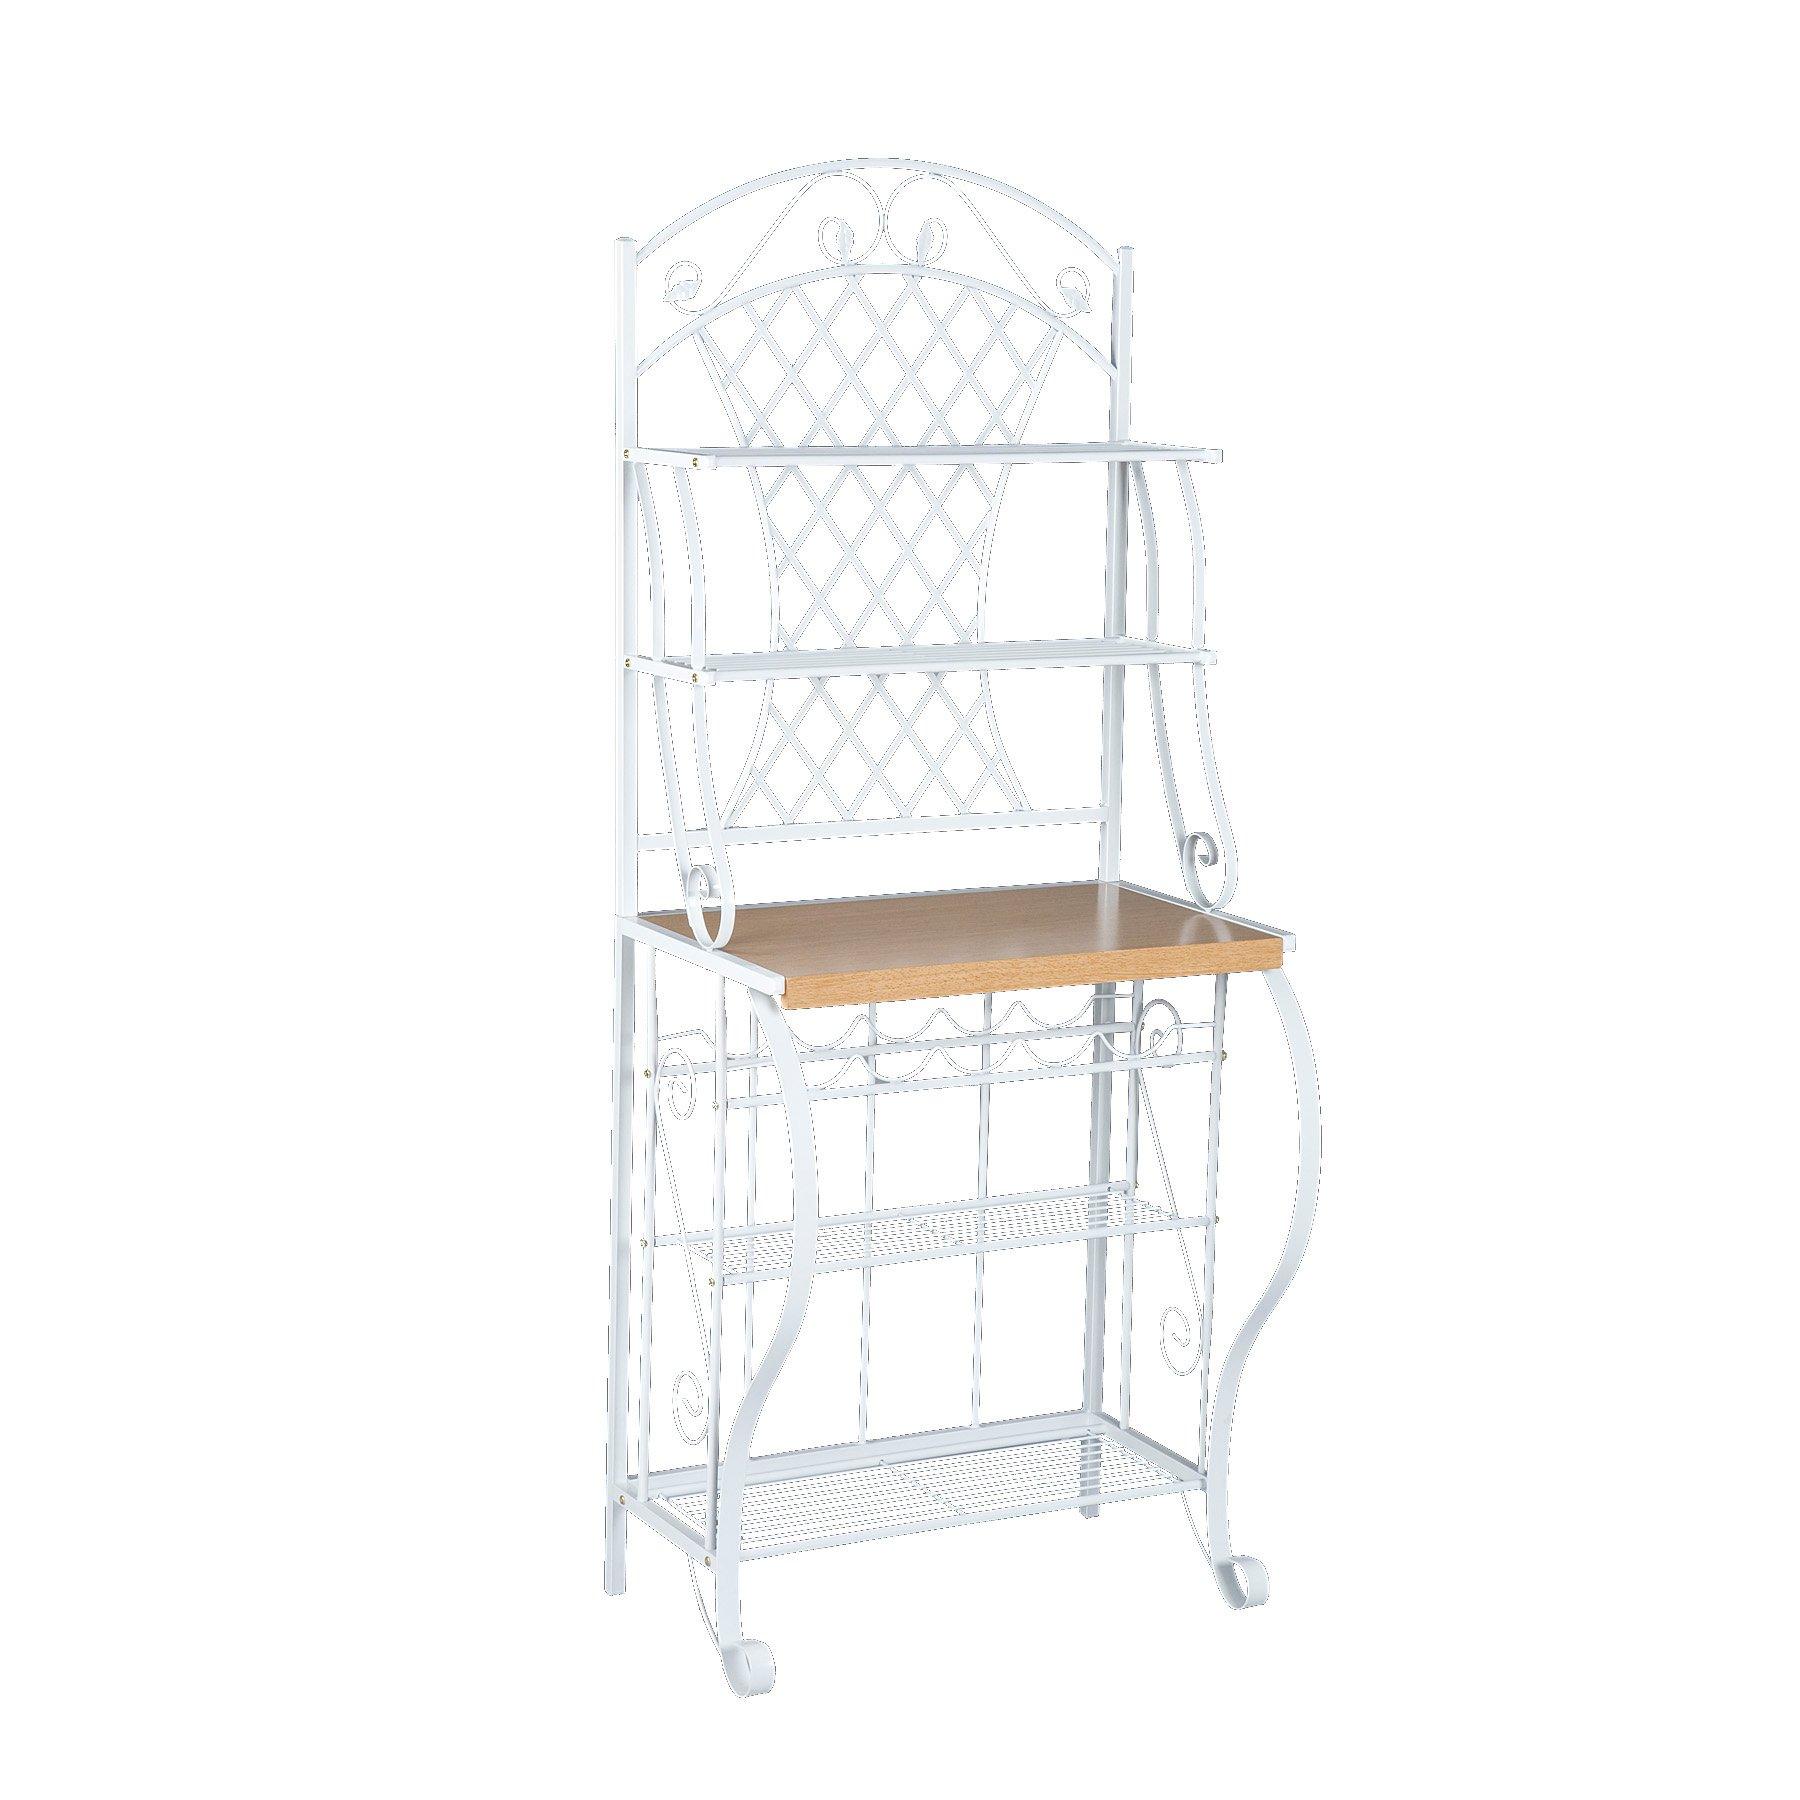 Trellis Bakers Rack w/ Scroll Work - White Metal Frame & Oak Finish Shelf - Chic Design by SEI